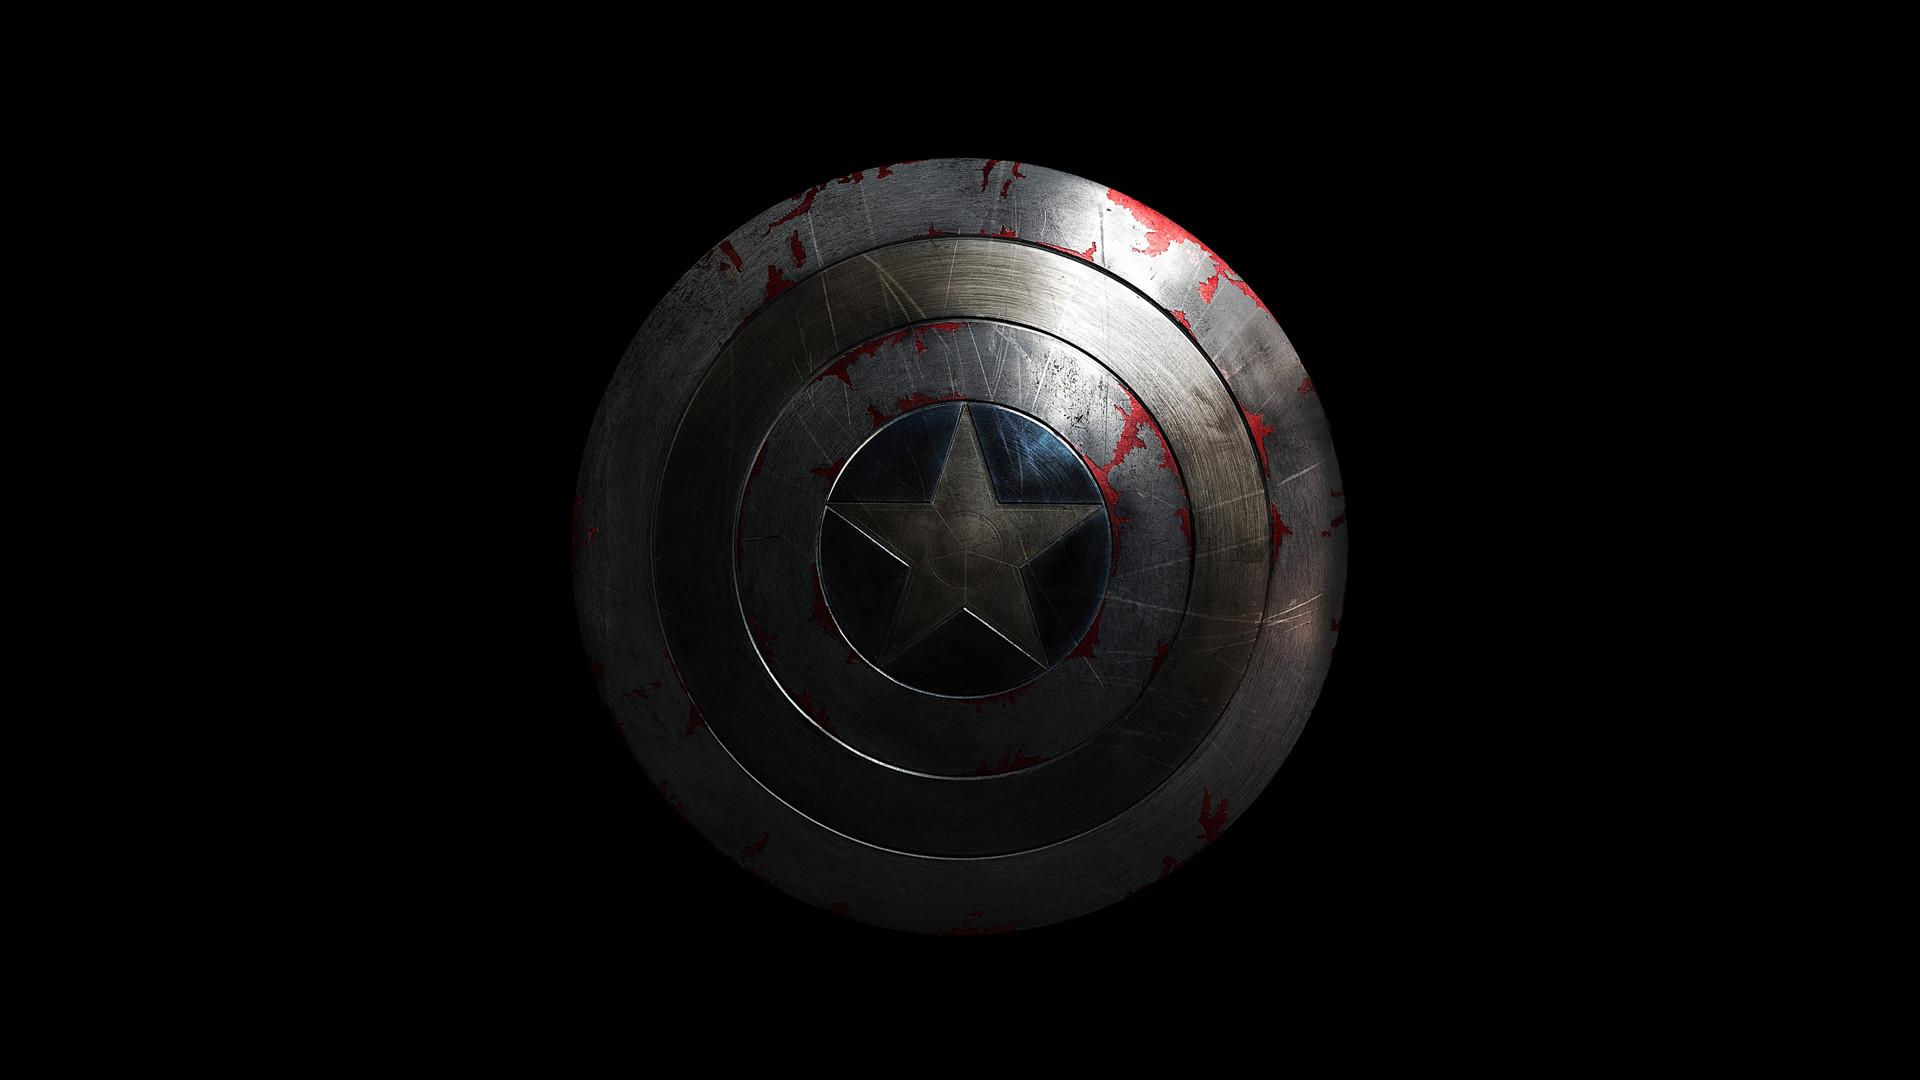 1920x1080 Captain America Shield Hd Wallpaper Tumblr 13